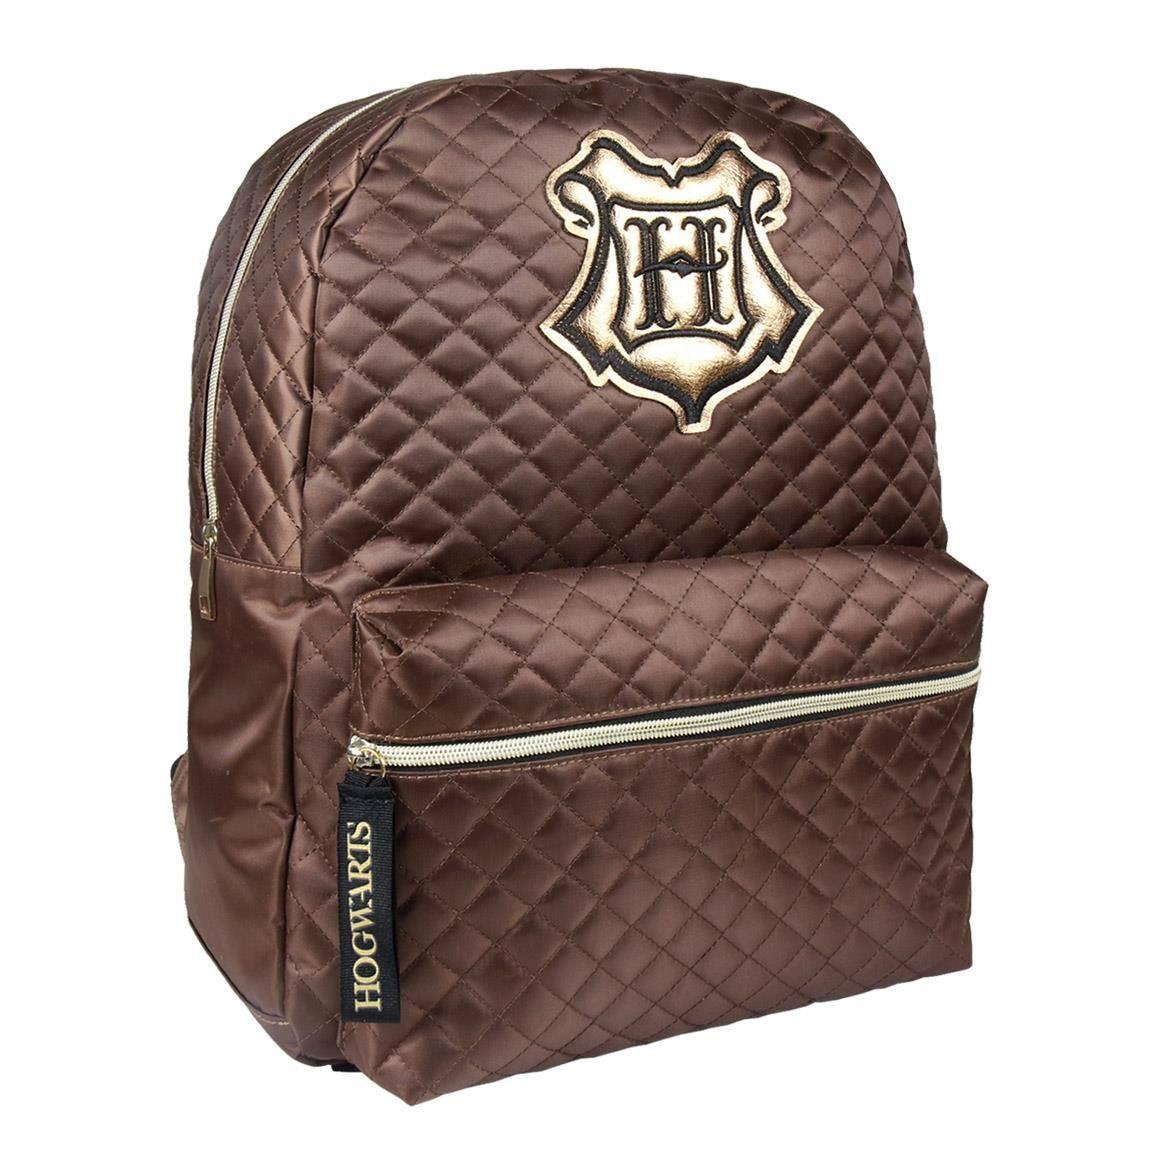 Harry Potter Casual Fashion Backpack Hogwarts Logo 30 x 40 x 13 cm